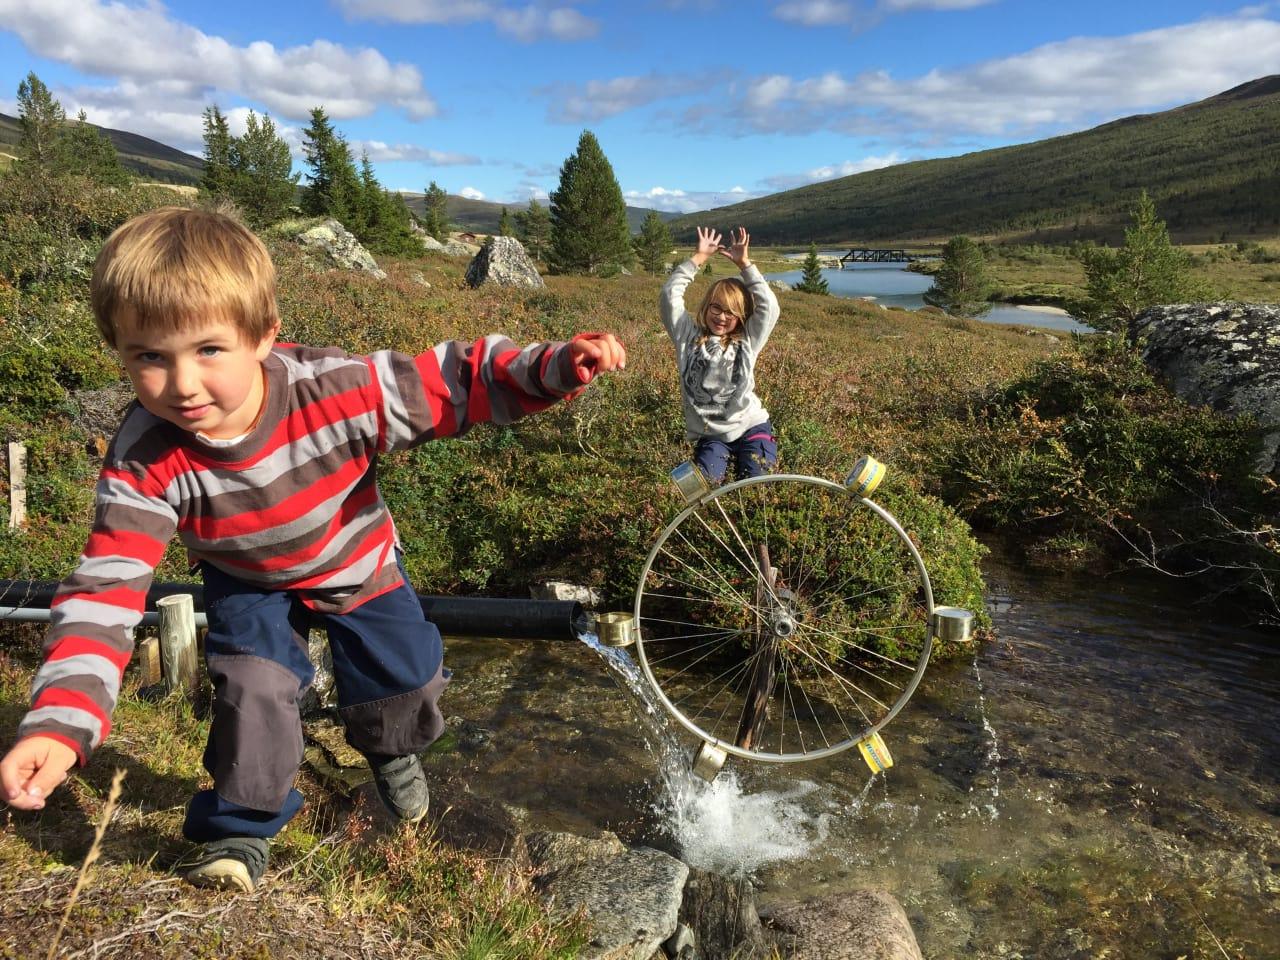 FAMILIEFAVORITT: I denne dalen uten navn lokker hjul hele året. Foto: Sigurd Rønningen